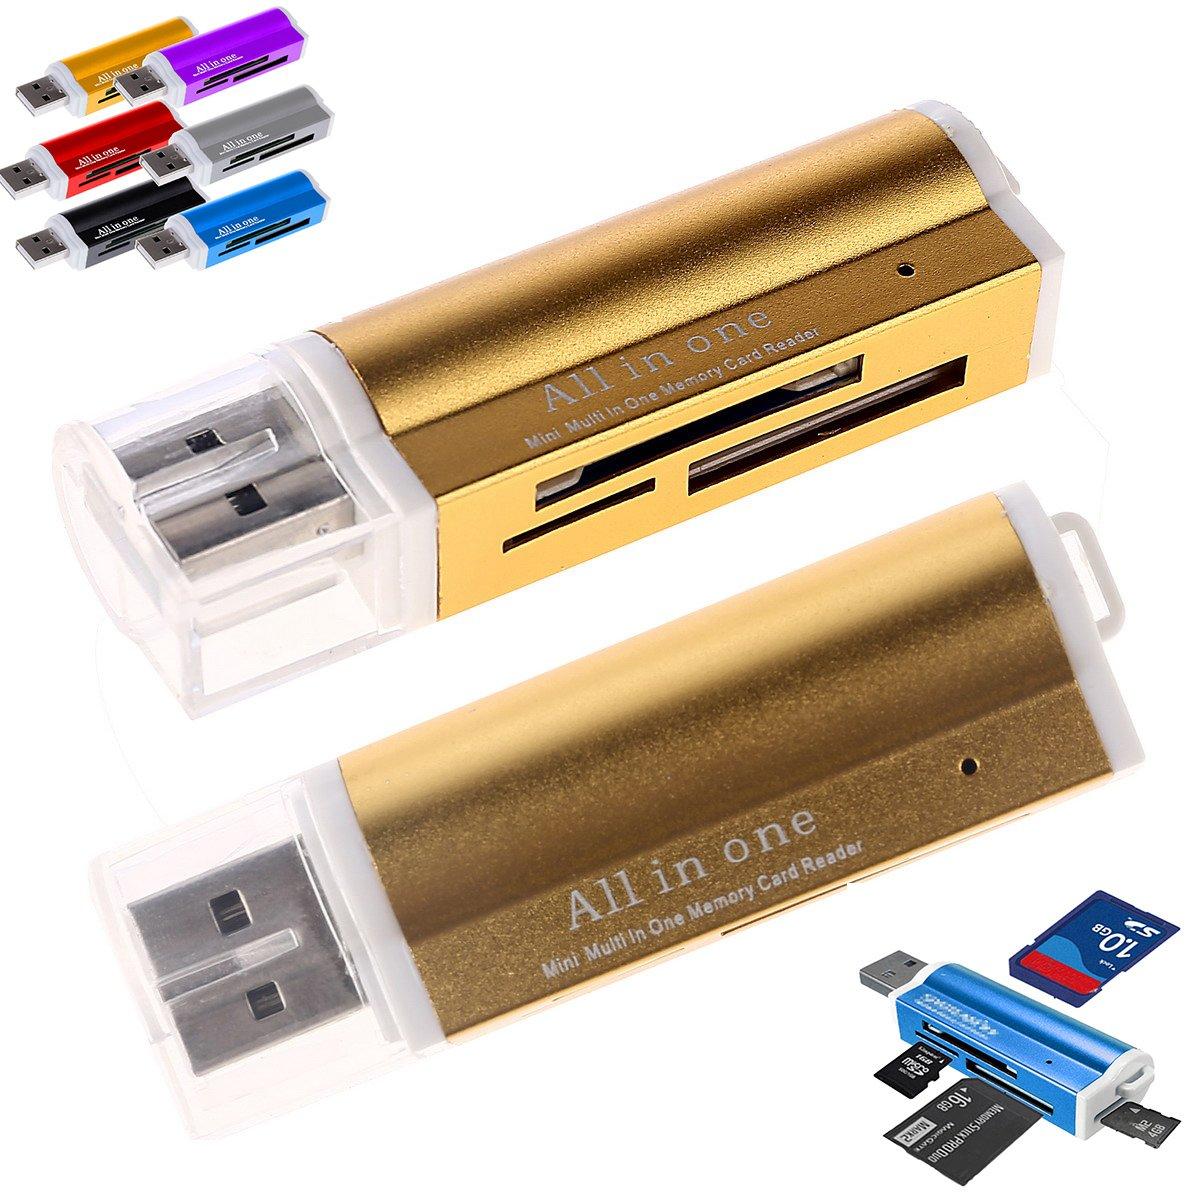 T-Flash, Memory Stick MS Micro M2 MS Pro Duo, microSD//SDHC, SD//SDHC, MMC, USB 2.0 LinQ/® Multi-Kartenleser 15 in 1 ,blau